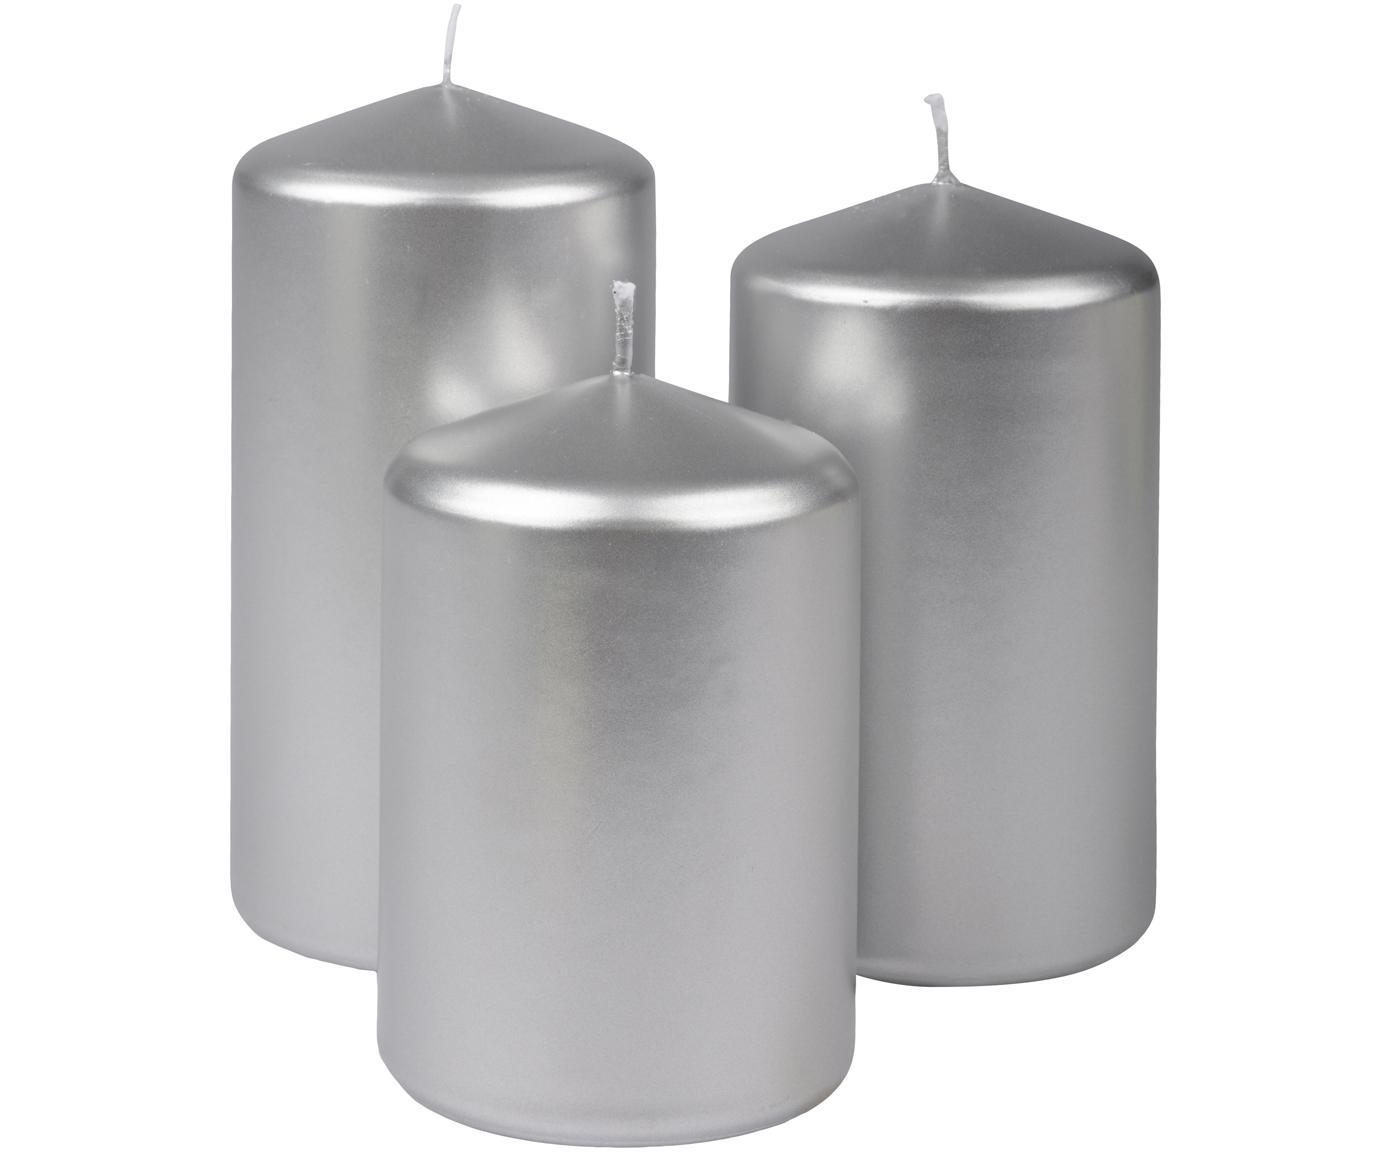 Set de velas Parilla, 3pzas., Cera, Plateado, Tamaños diferentes